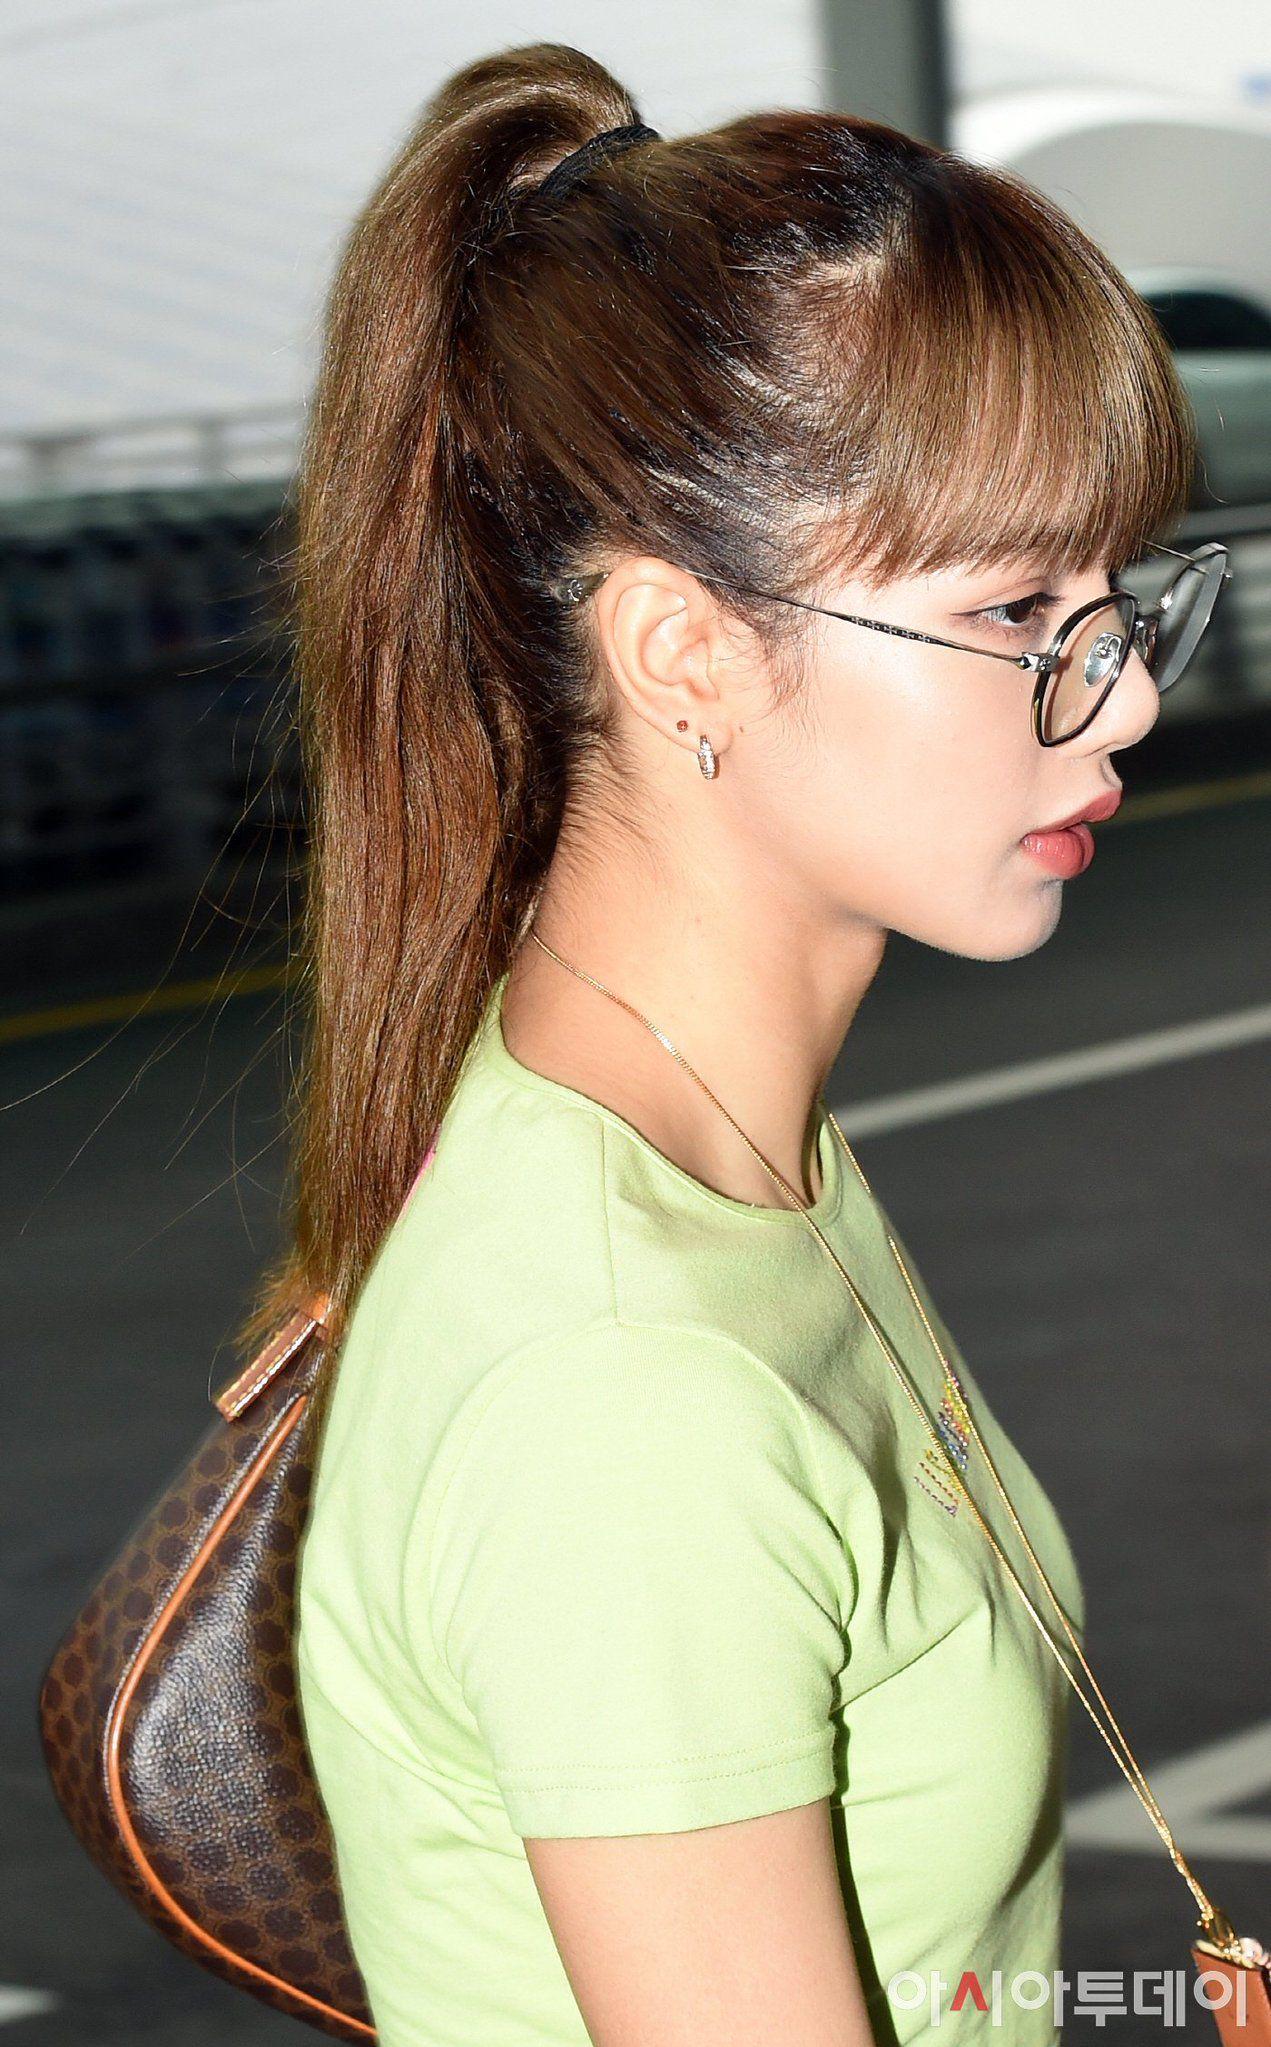 Pin by ًm🍦 on BLΛƆKPIИK Blackpink, Girl side profile, Lisa